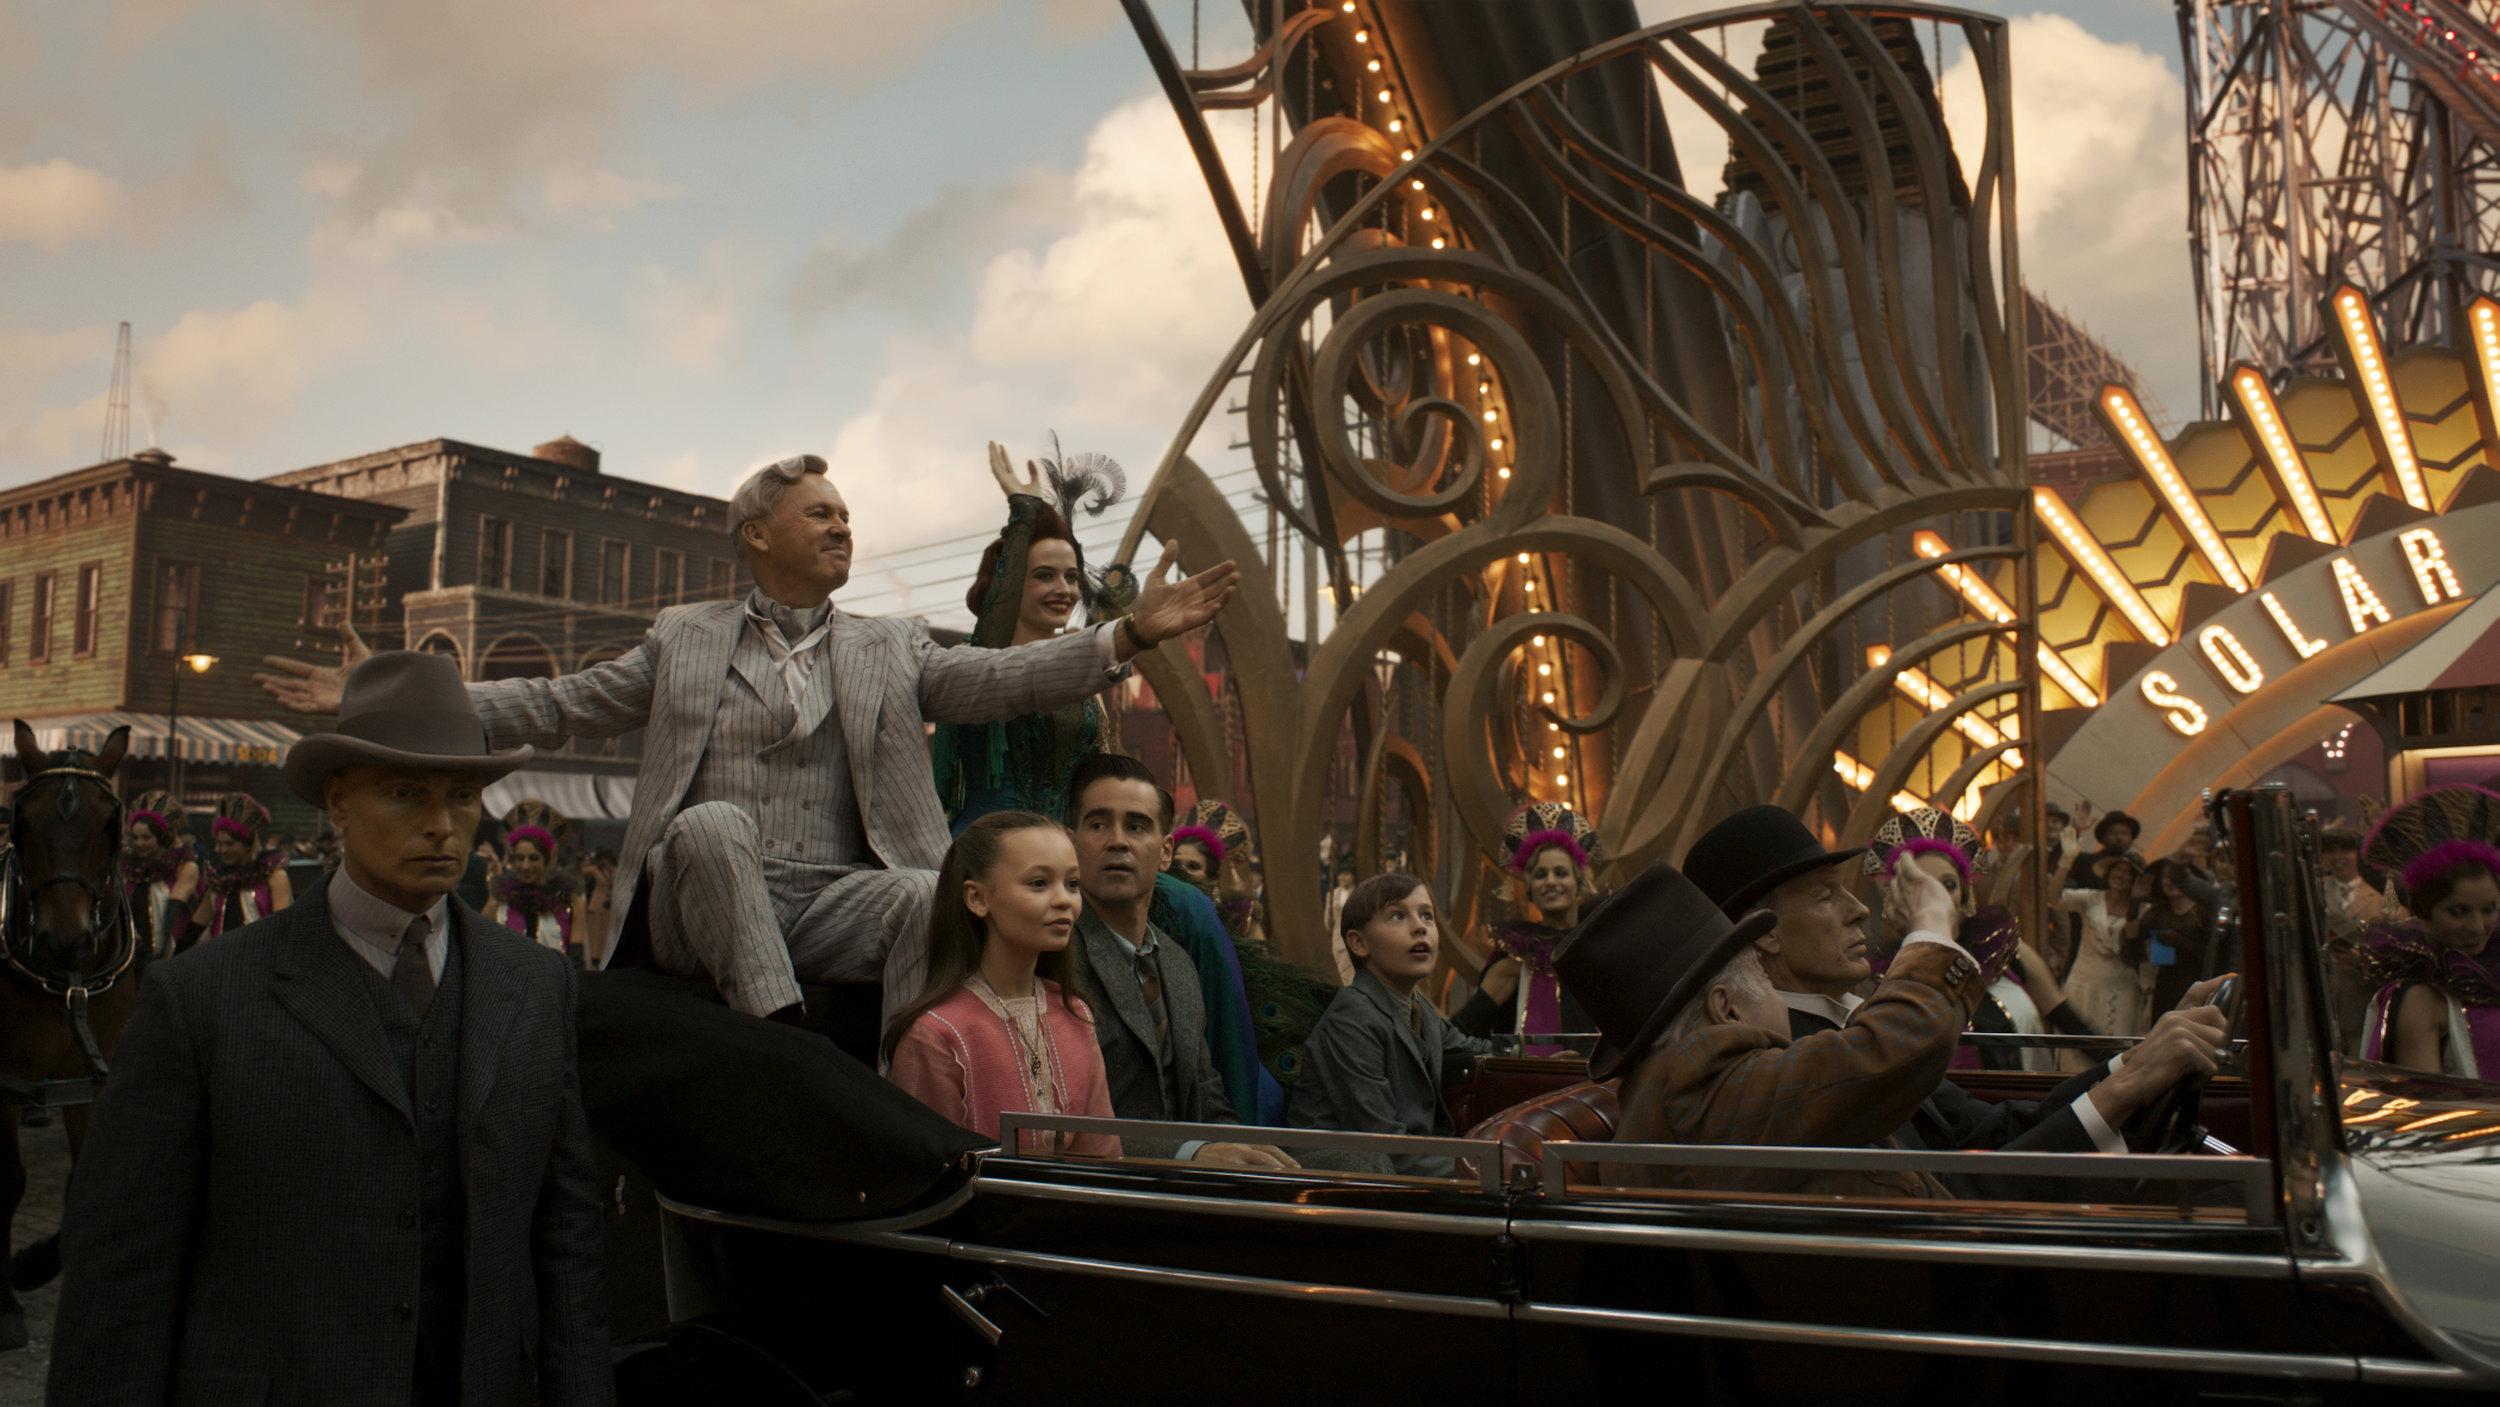 Michael Keaton, Eva Green, Nico Parker, Colin Farrell, and Finley Hobbins   Walt Disney Studios Motion Pictures